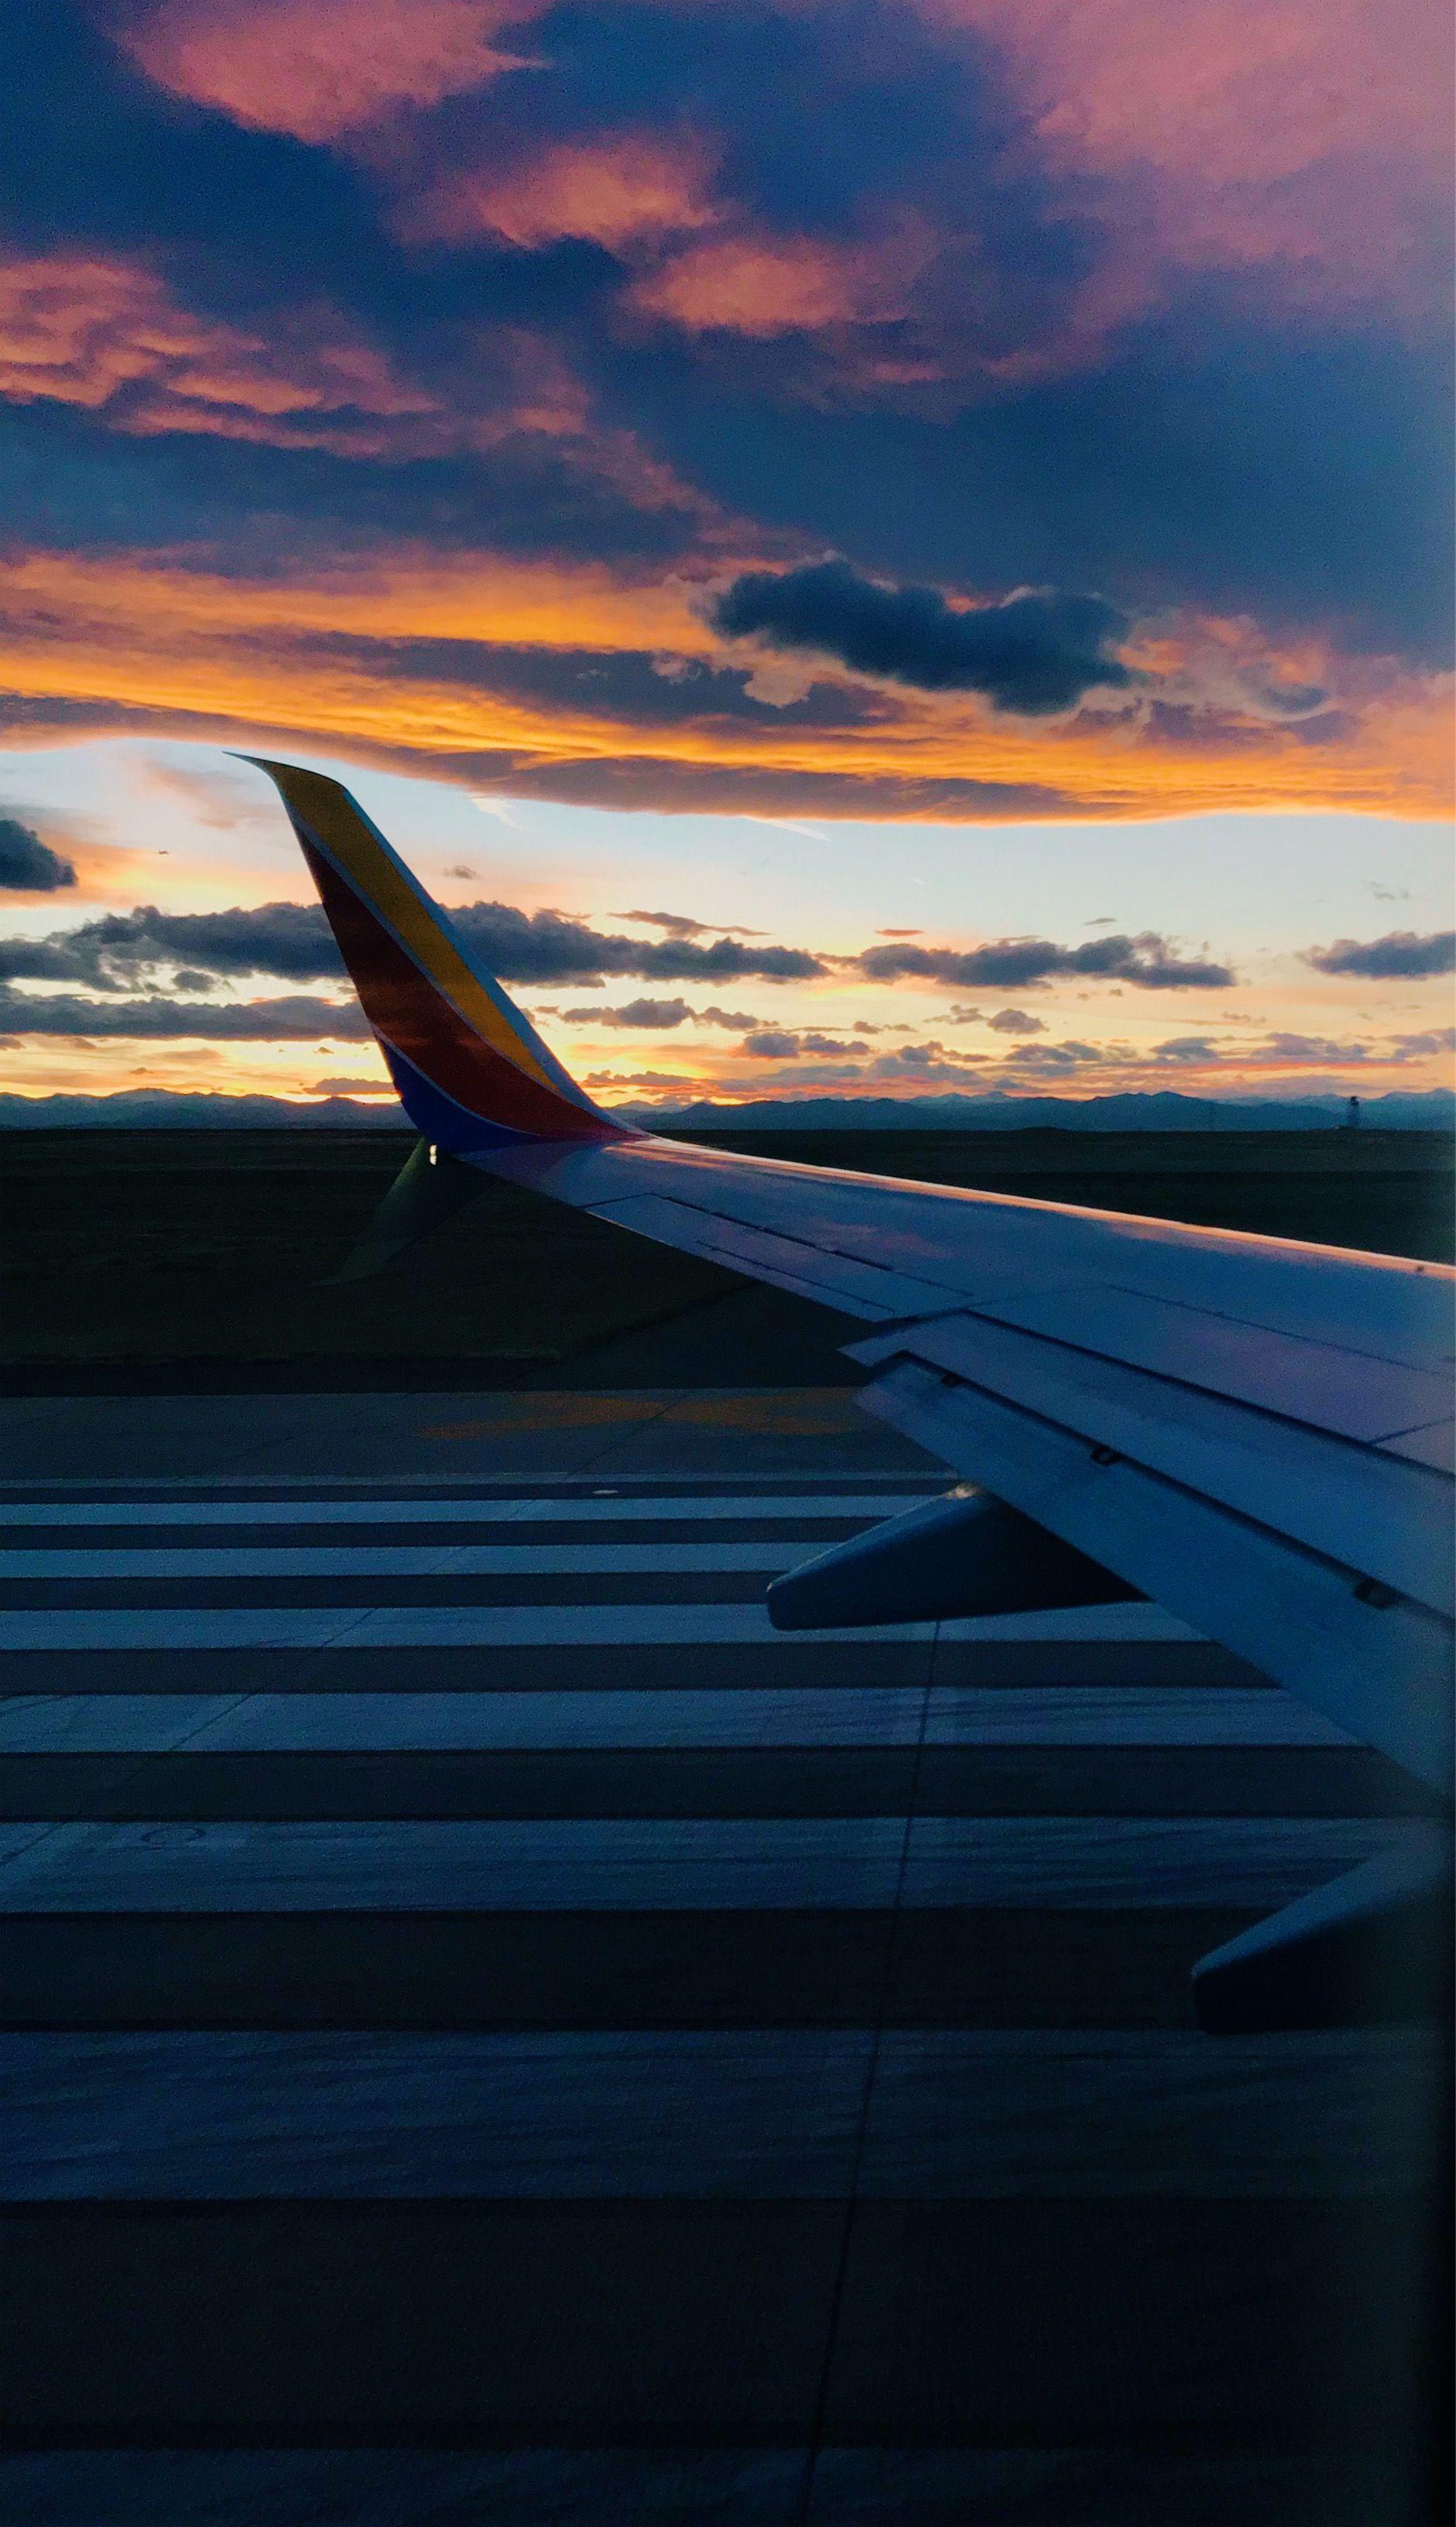 Fine Airplane Plane Window Seat Views Sky Wing Flight Flights Machost Co Dining Chair Design Ideas Machostcouk